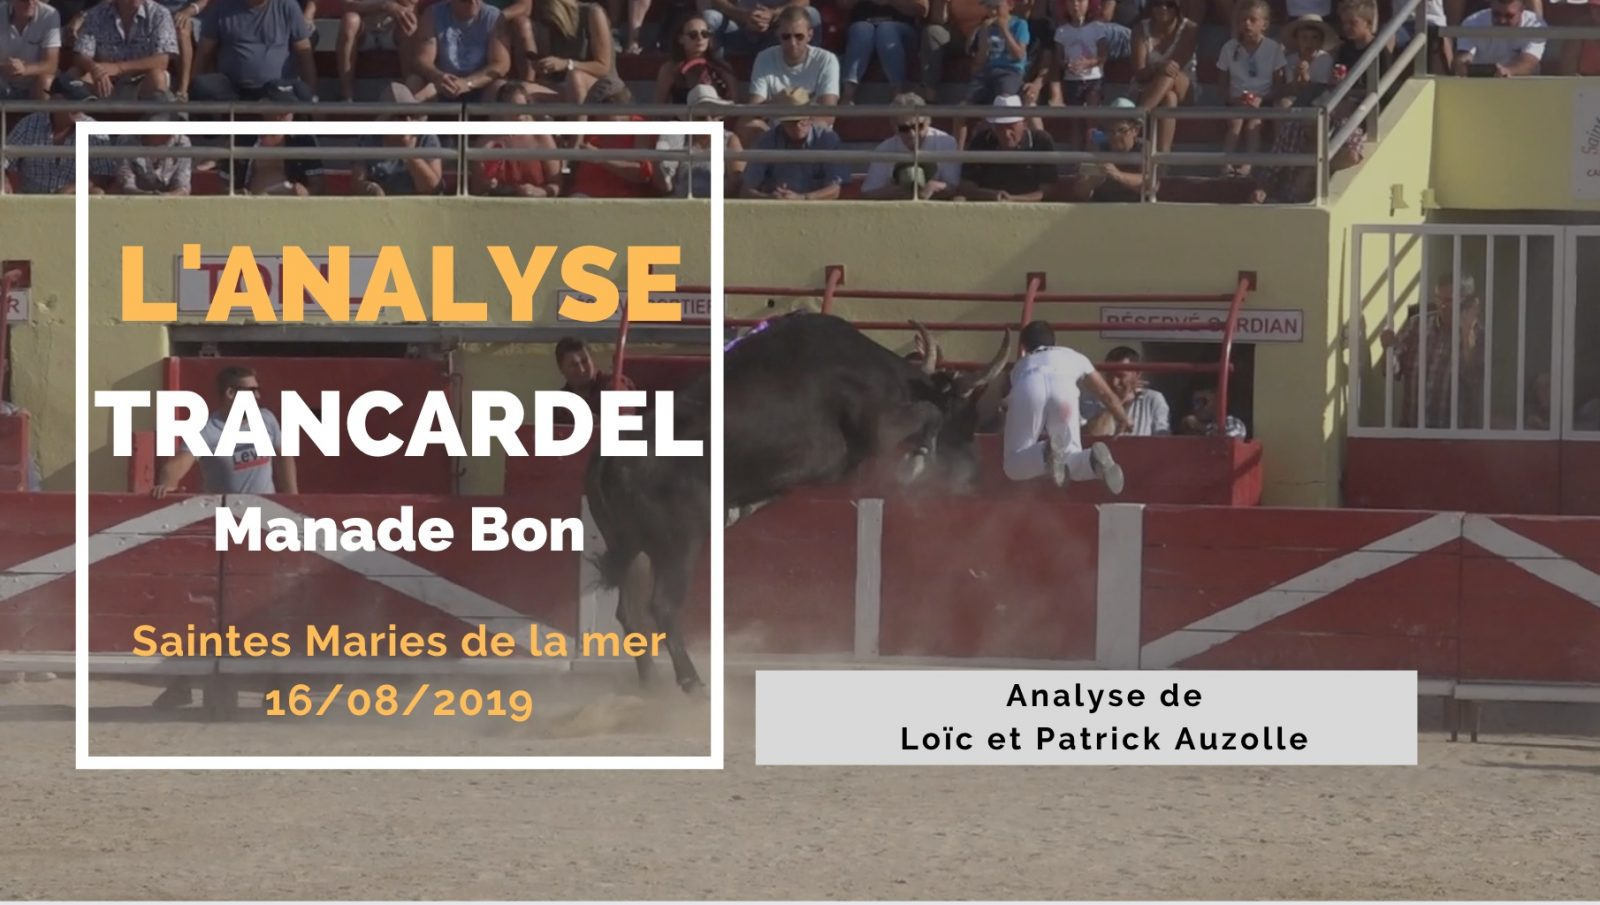 L'ANALYSE : Trancardel (Bon) – Saintes Maries de la Mer (16/08/2019)